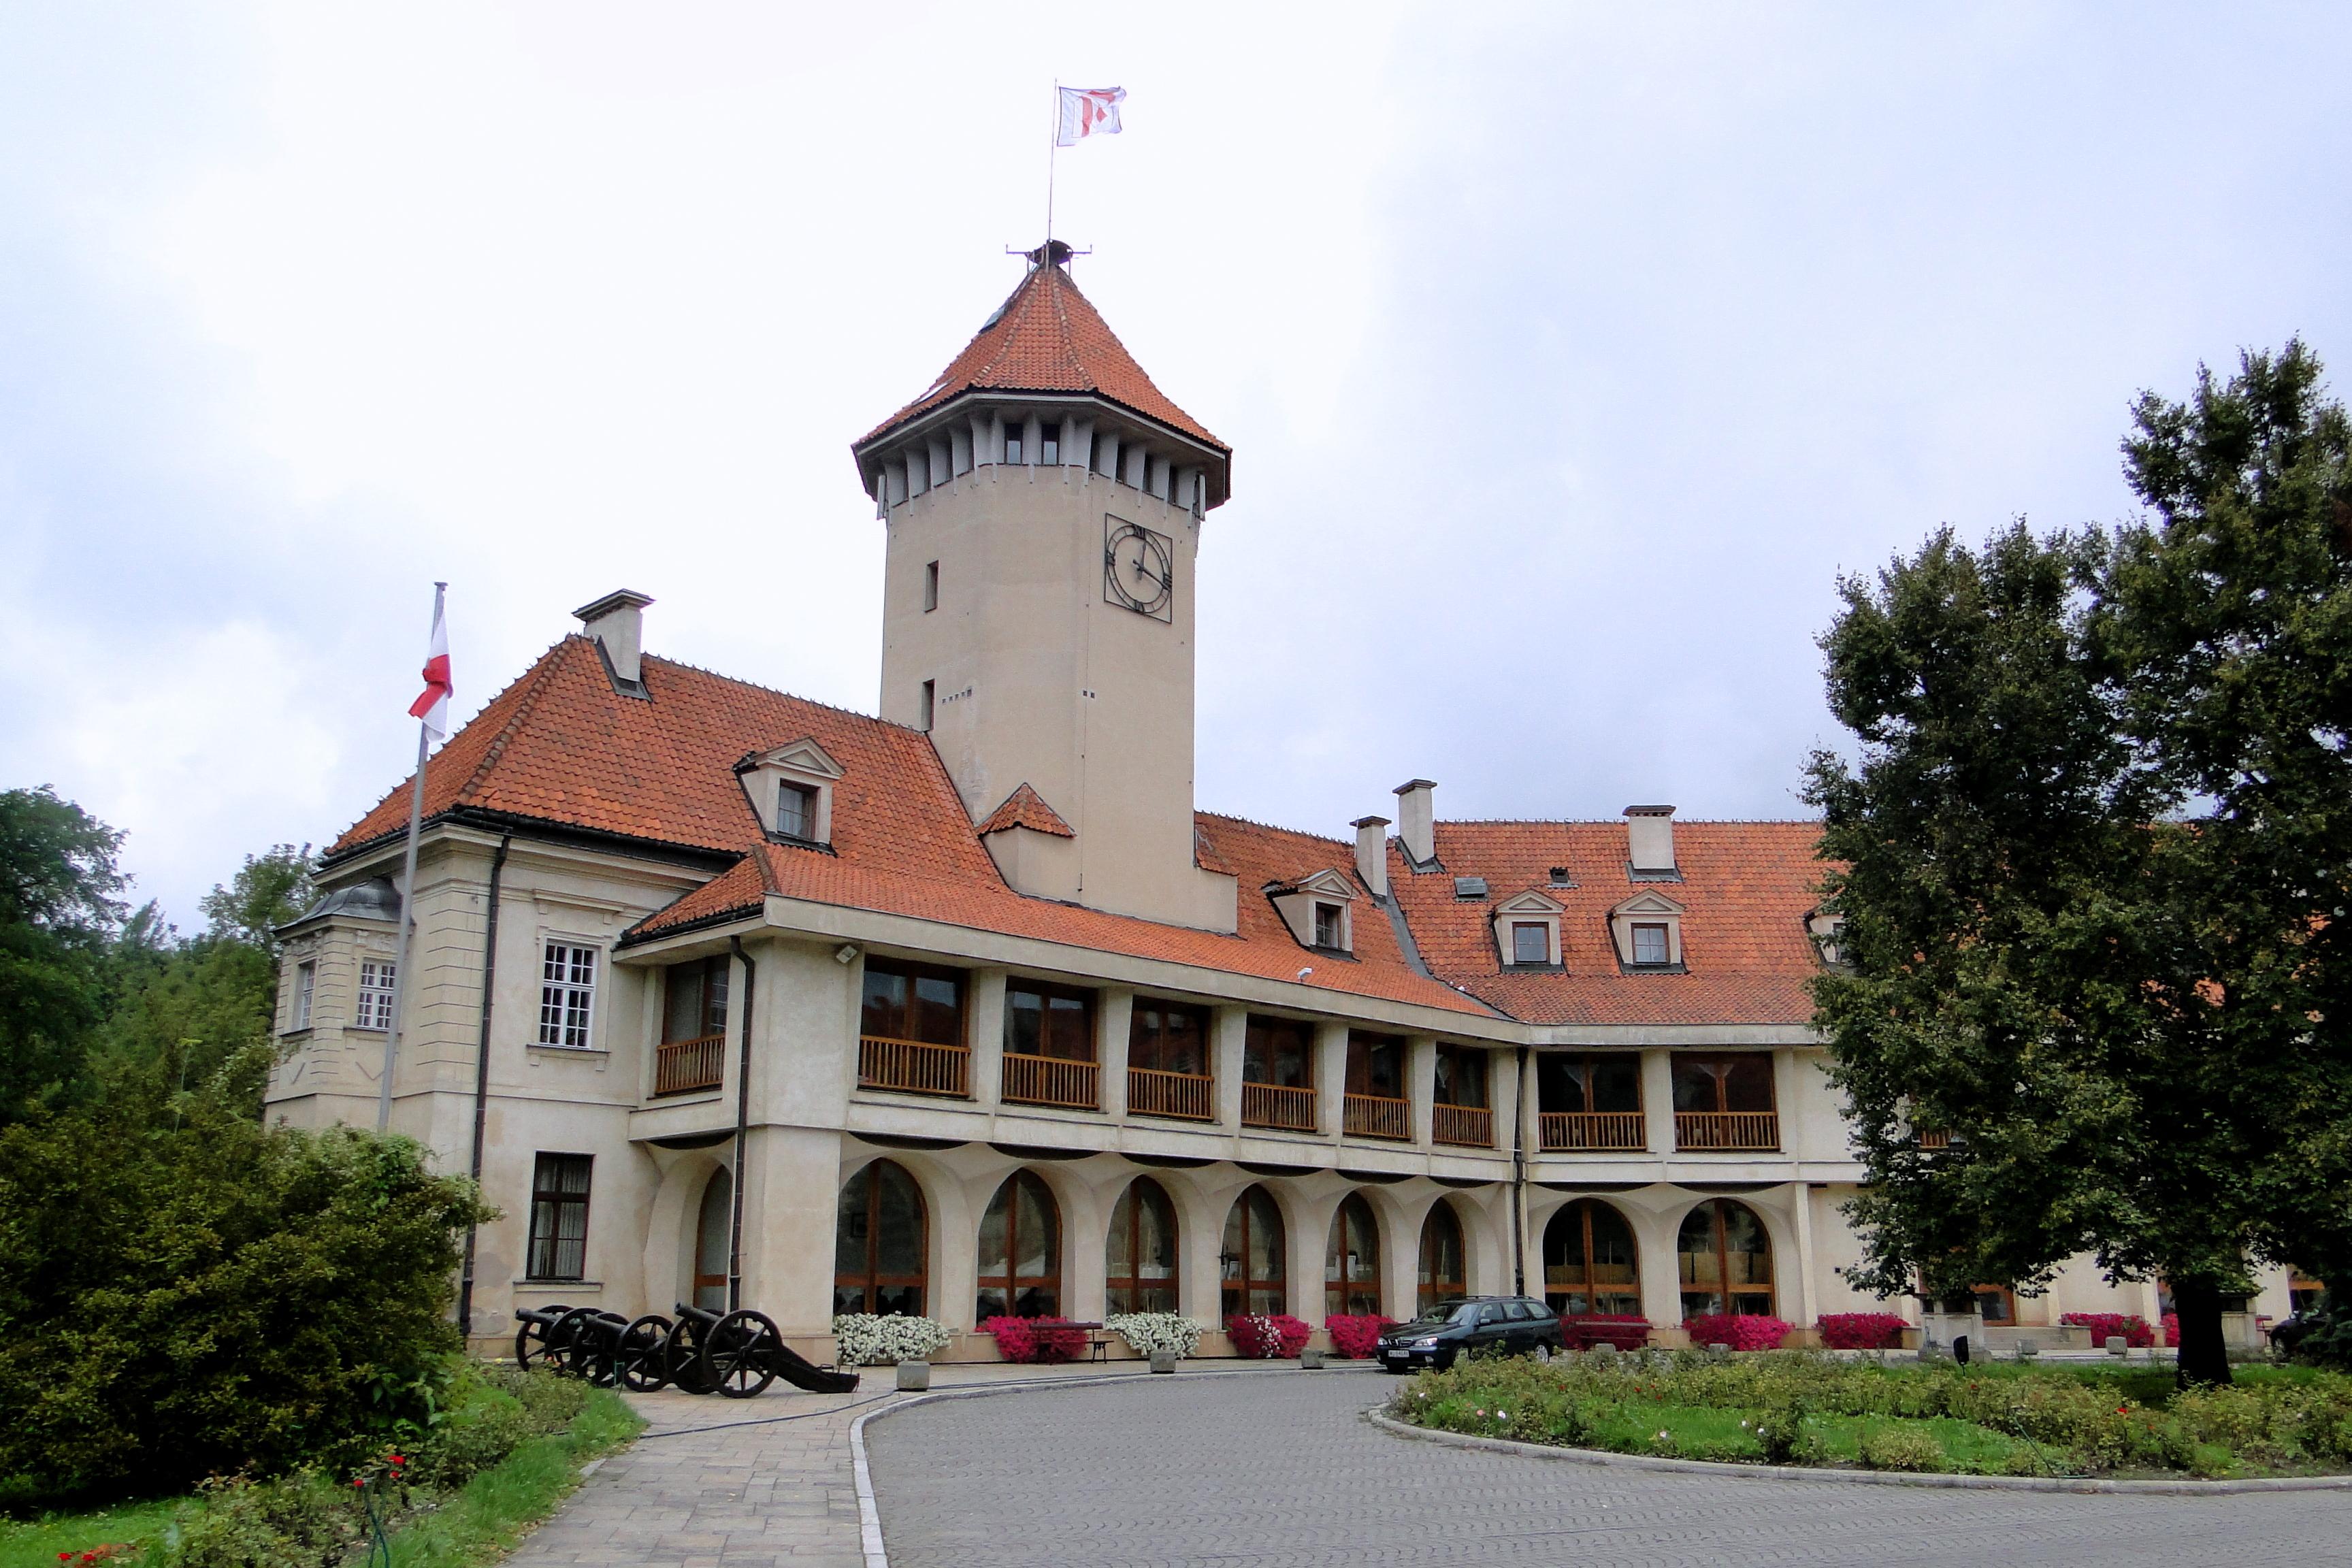 The Polonia Castle